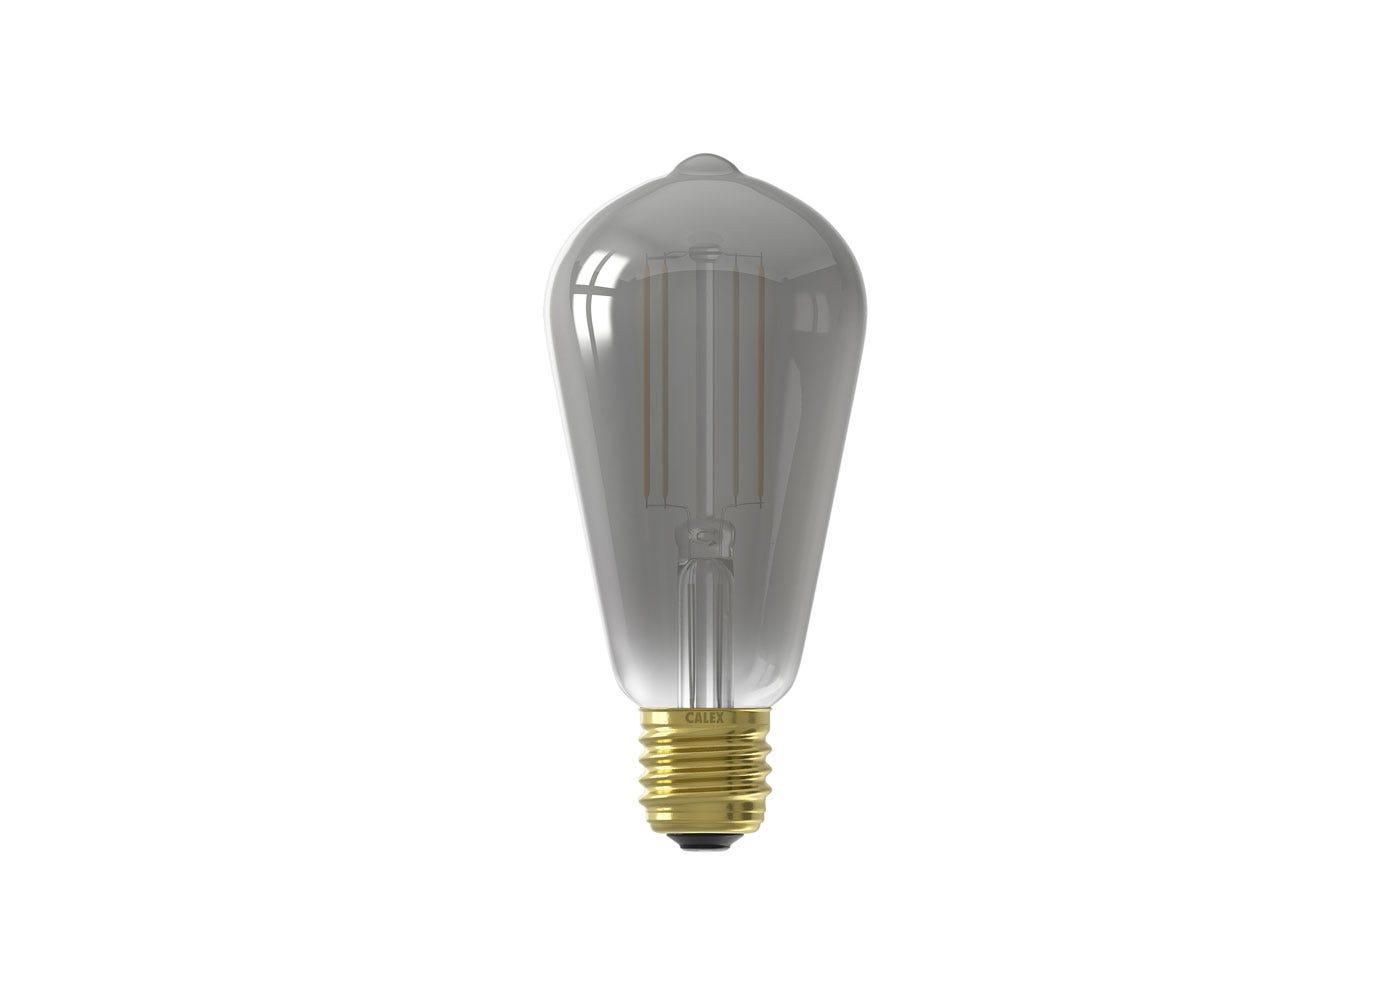 As shown: Smart LED Filament Rustic Smoke 7W E27 - Off